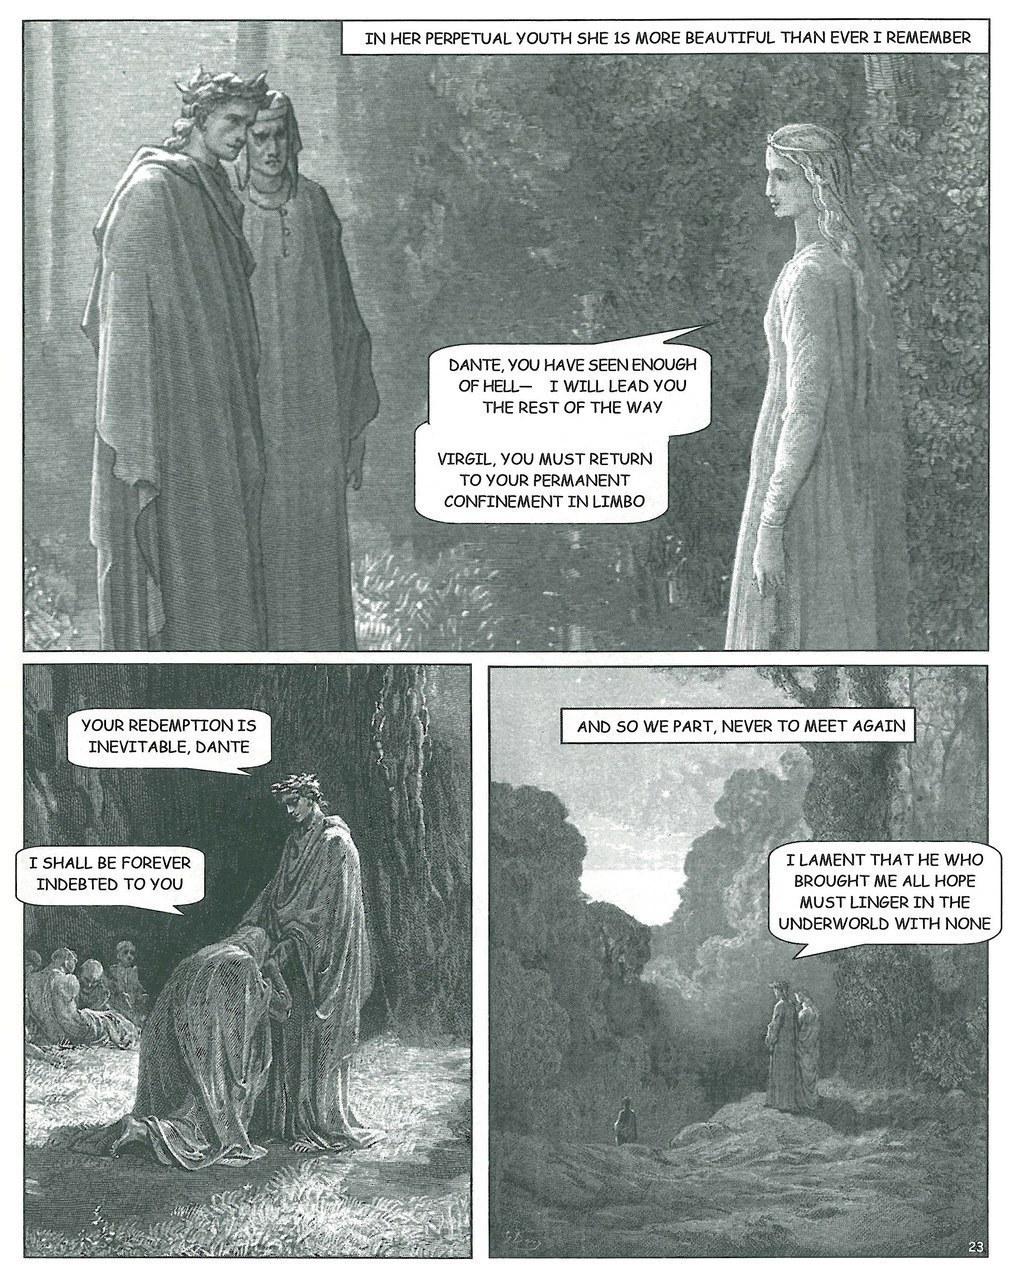 Joseph Lanzara,Dante incontra Beatrice, 2012, tav. 23